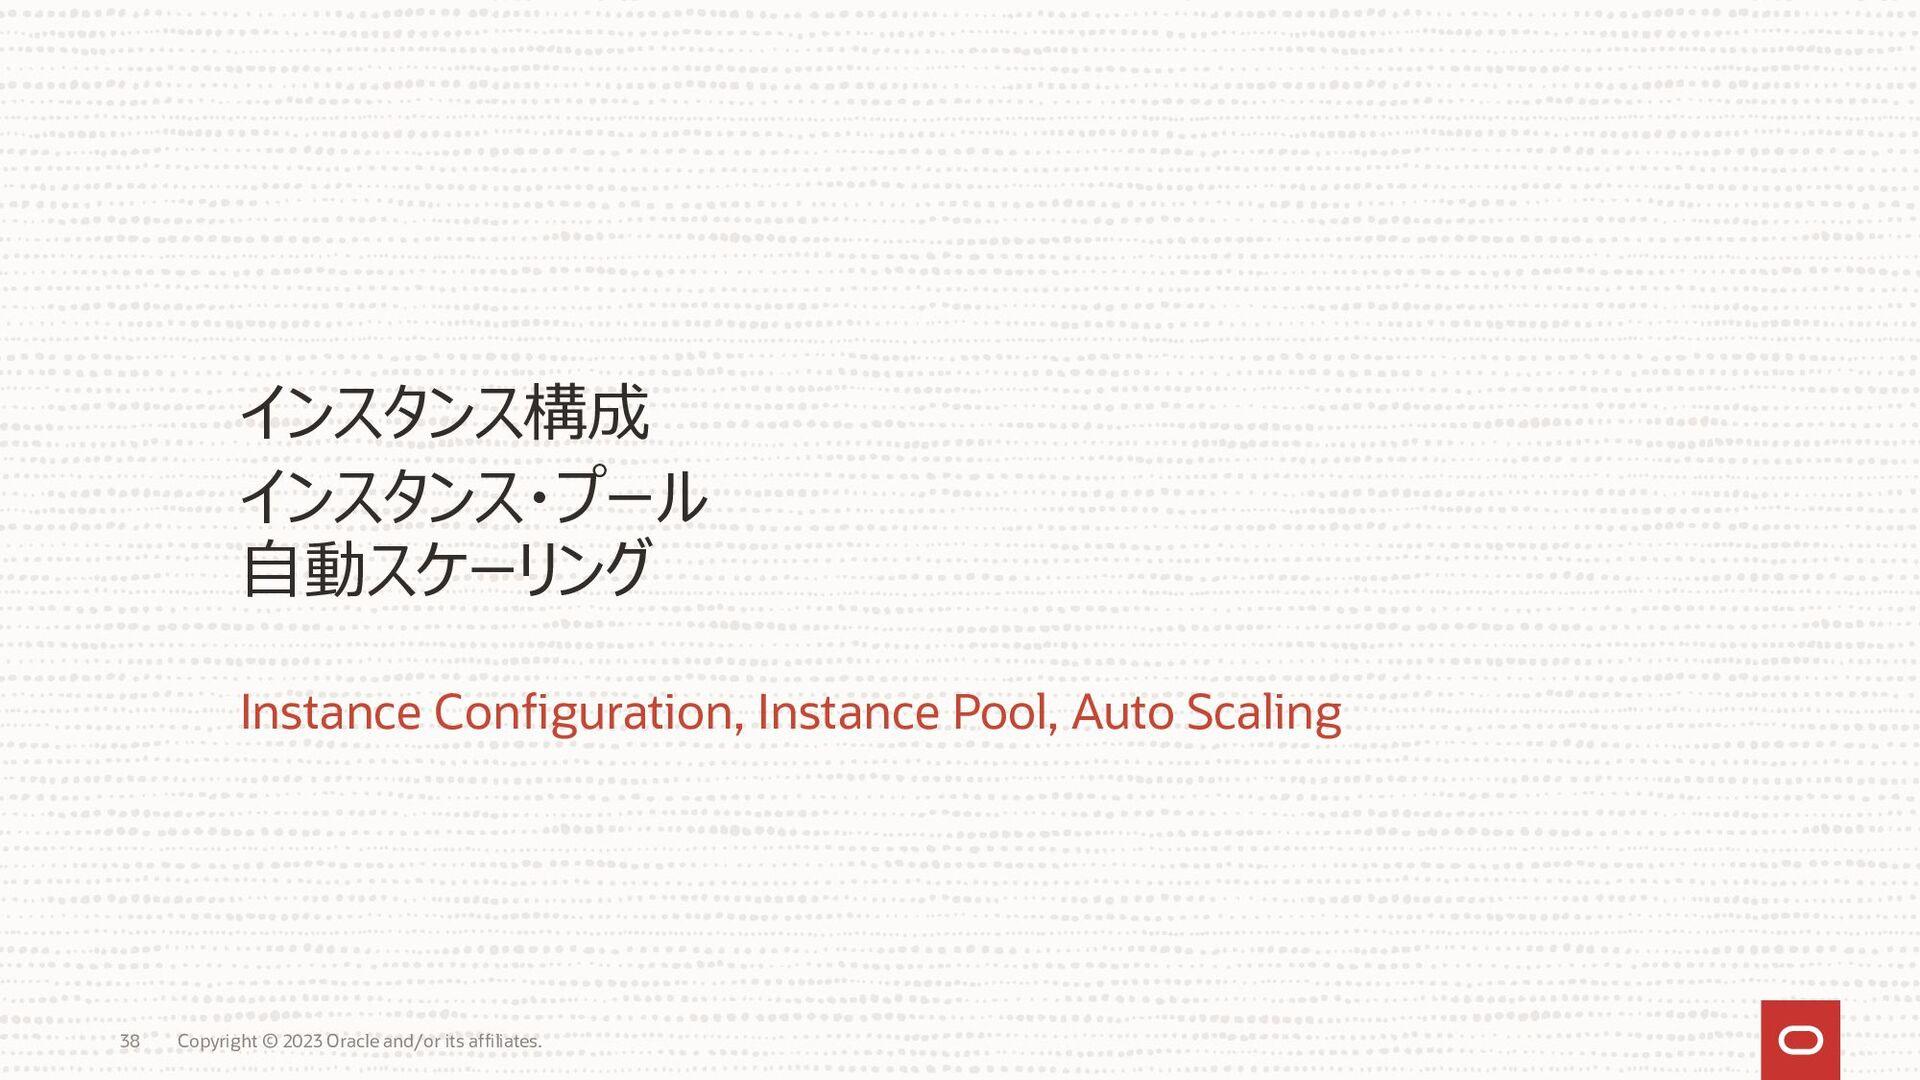 Oracle Cloud Infrastructure マニュアル (日本語 / 英語) • ...